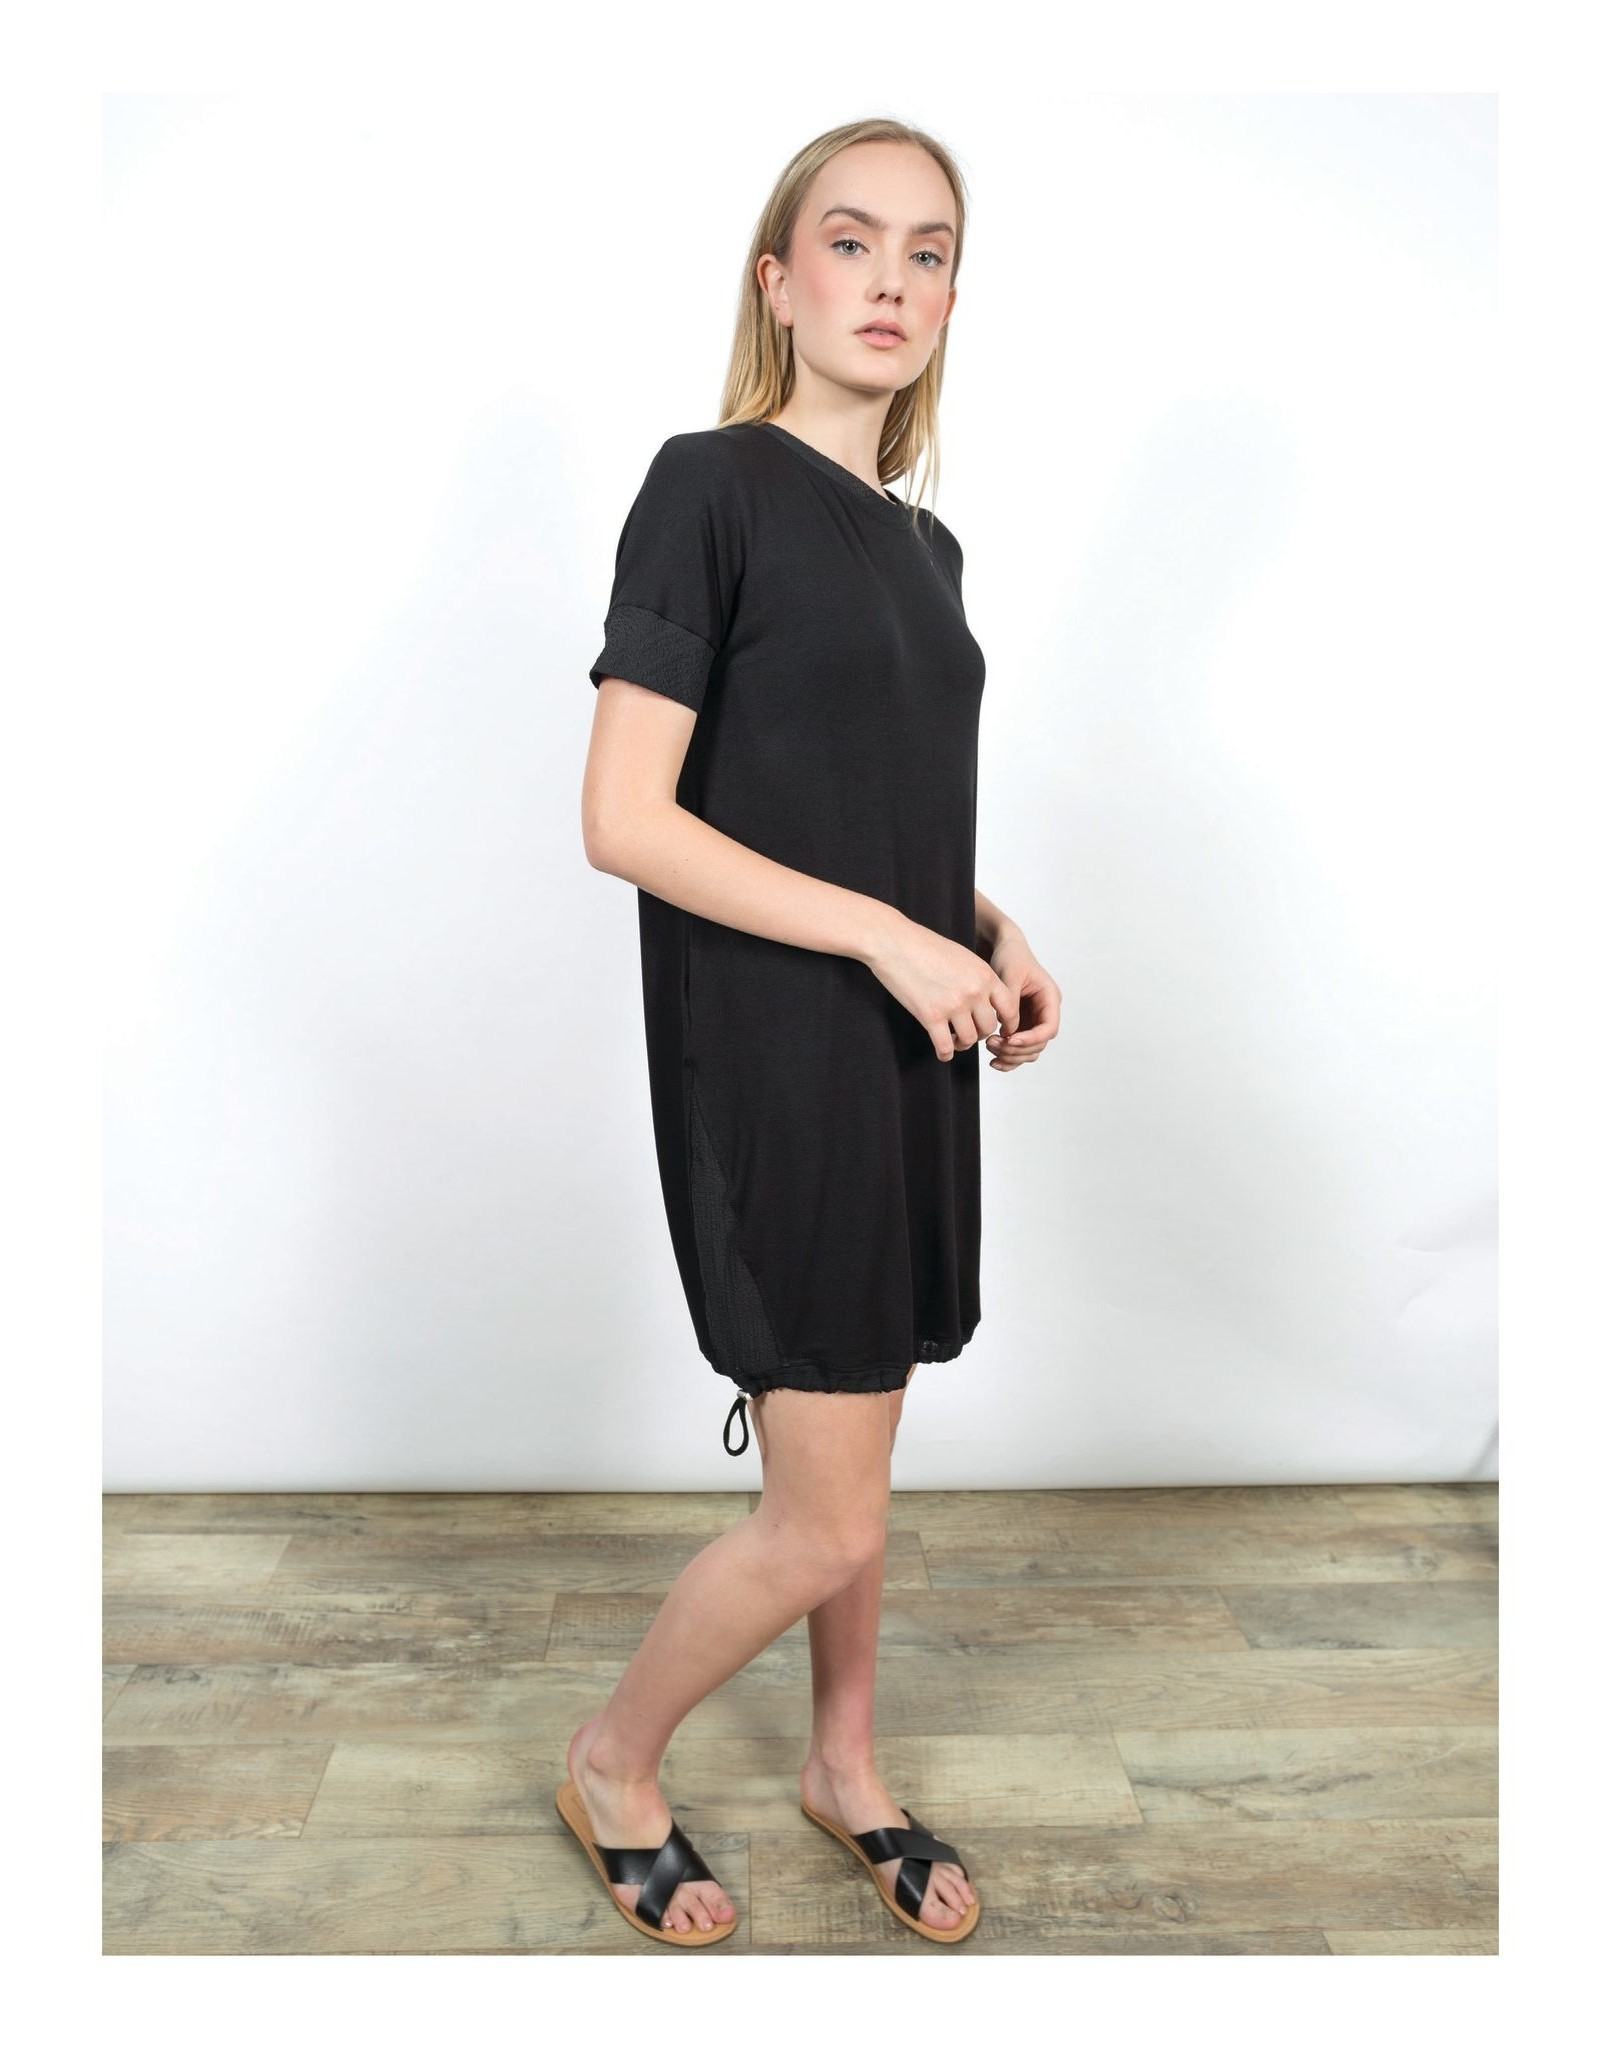 Shannon Passero Shannon Passero Malinda Dress - SMALL